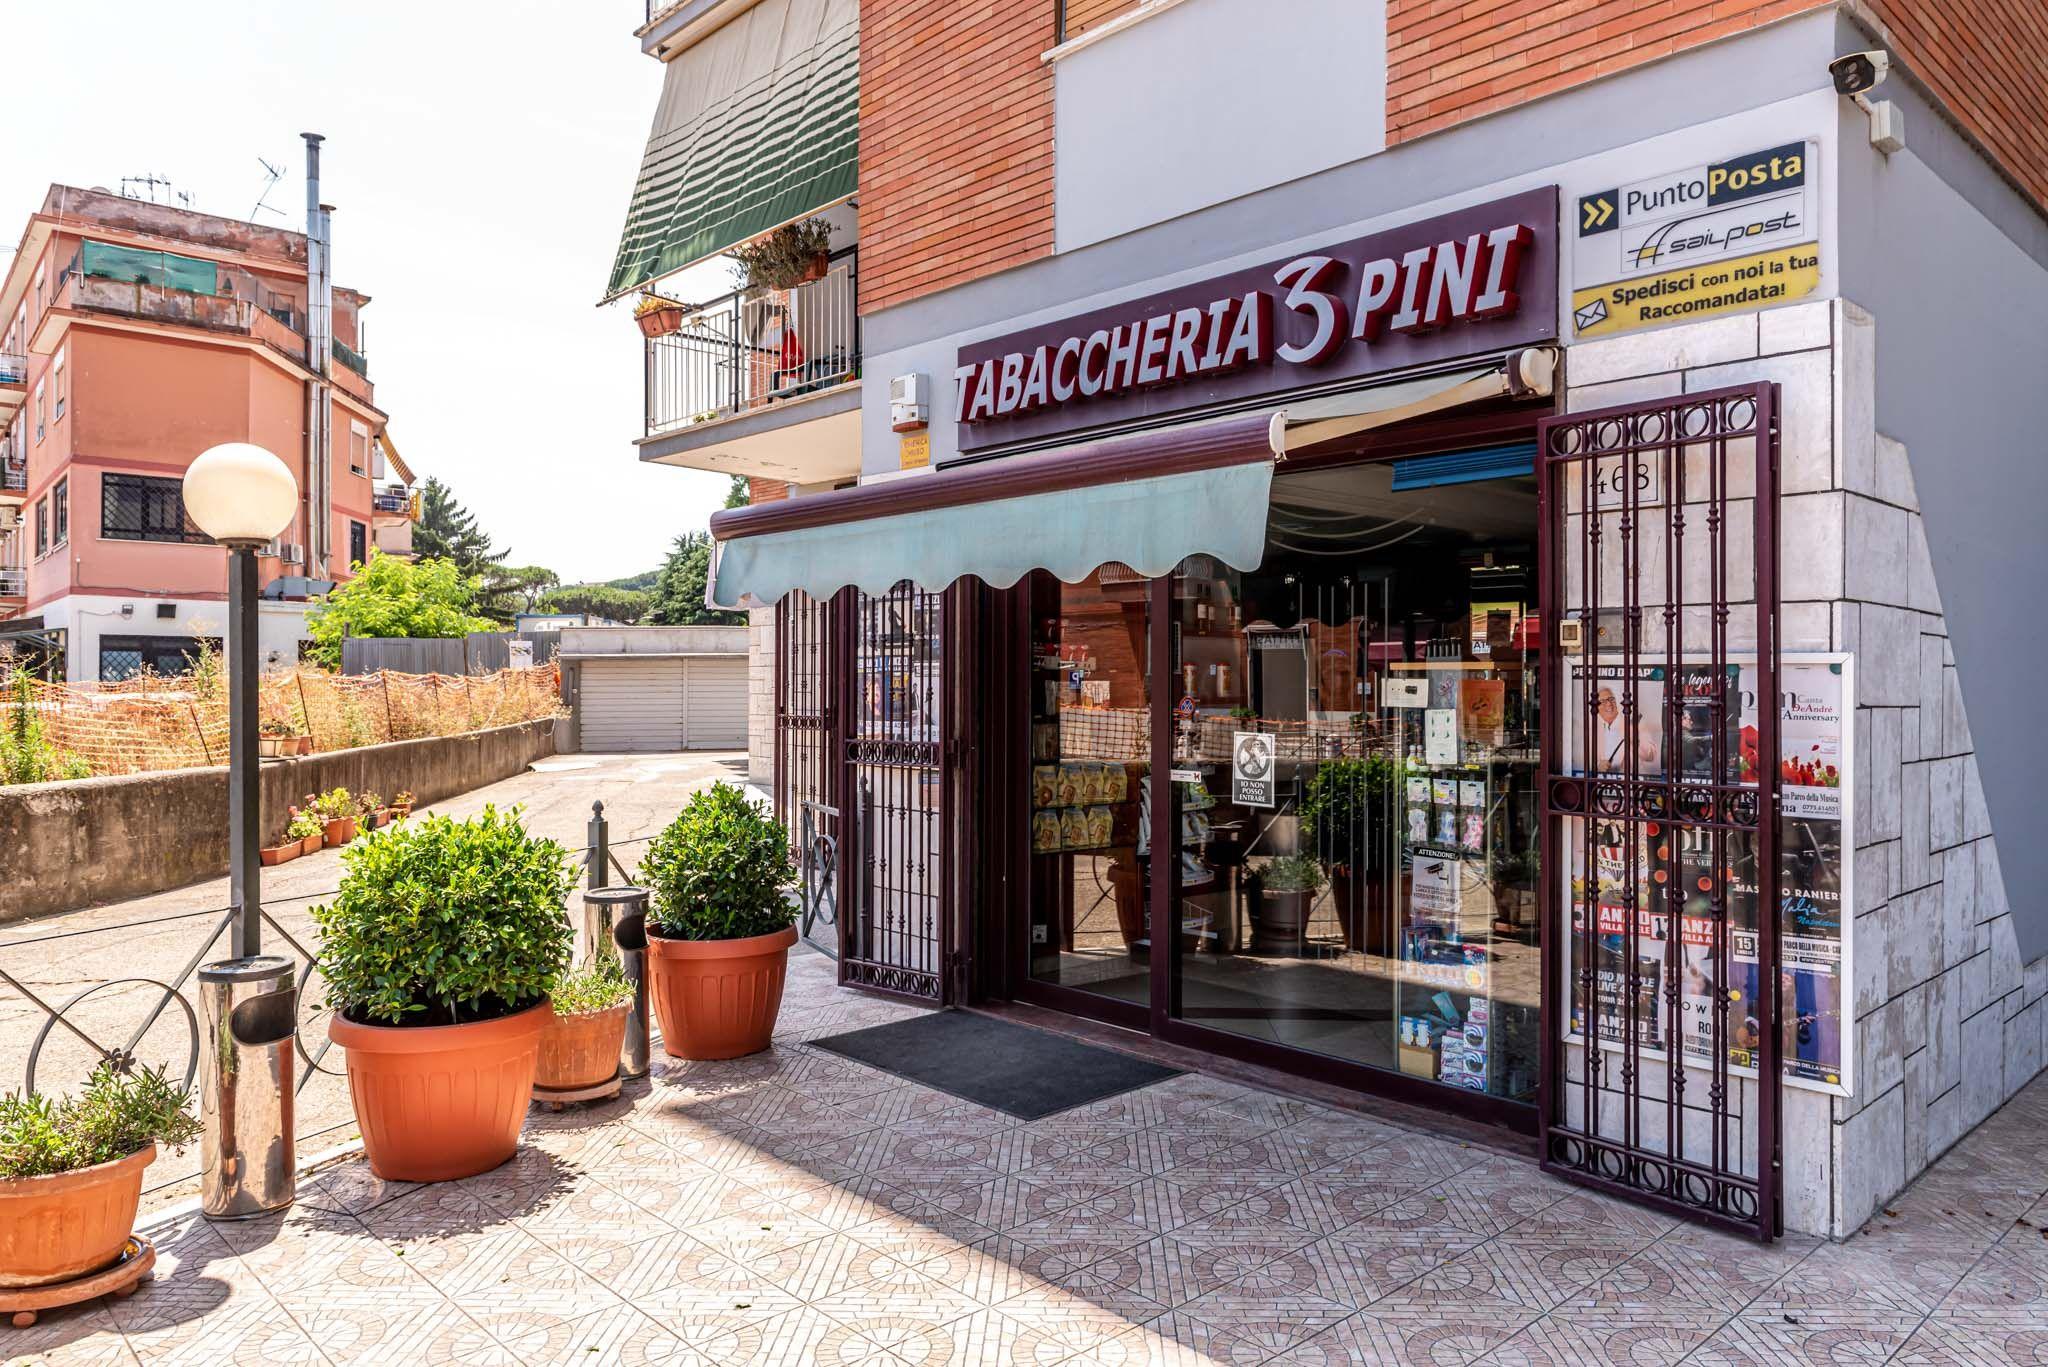 Bar Tabacchi Tre Pini